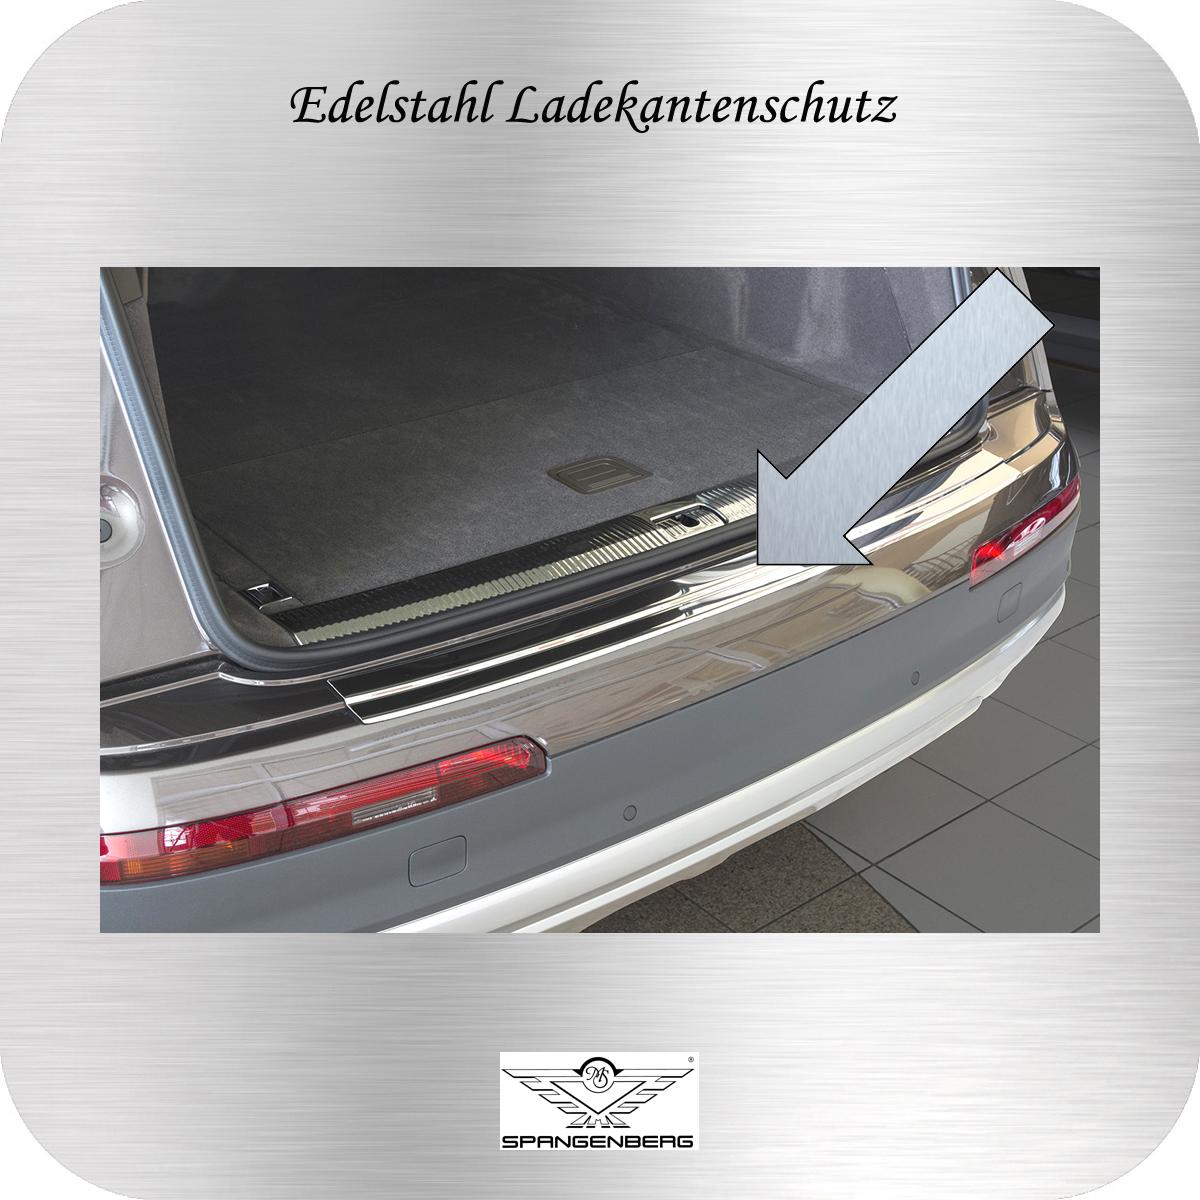 Ladekantenschutz Edelstahl Audi Q7 II SUV Typ 4M Kombi ab 2015- 3235733